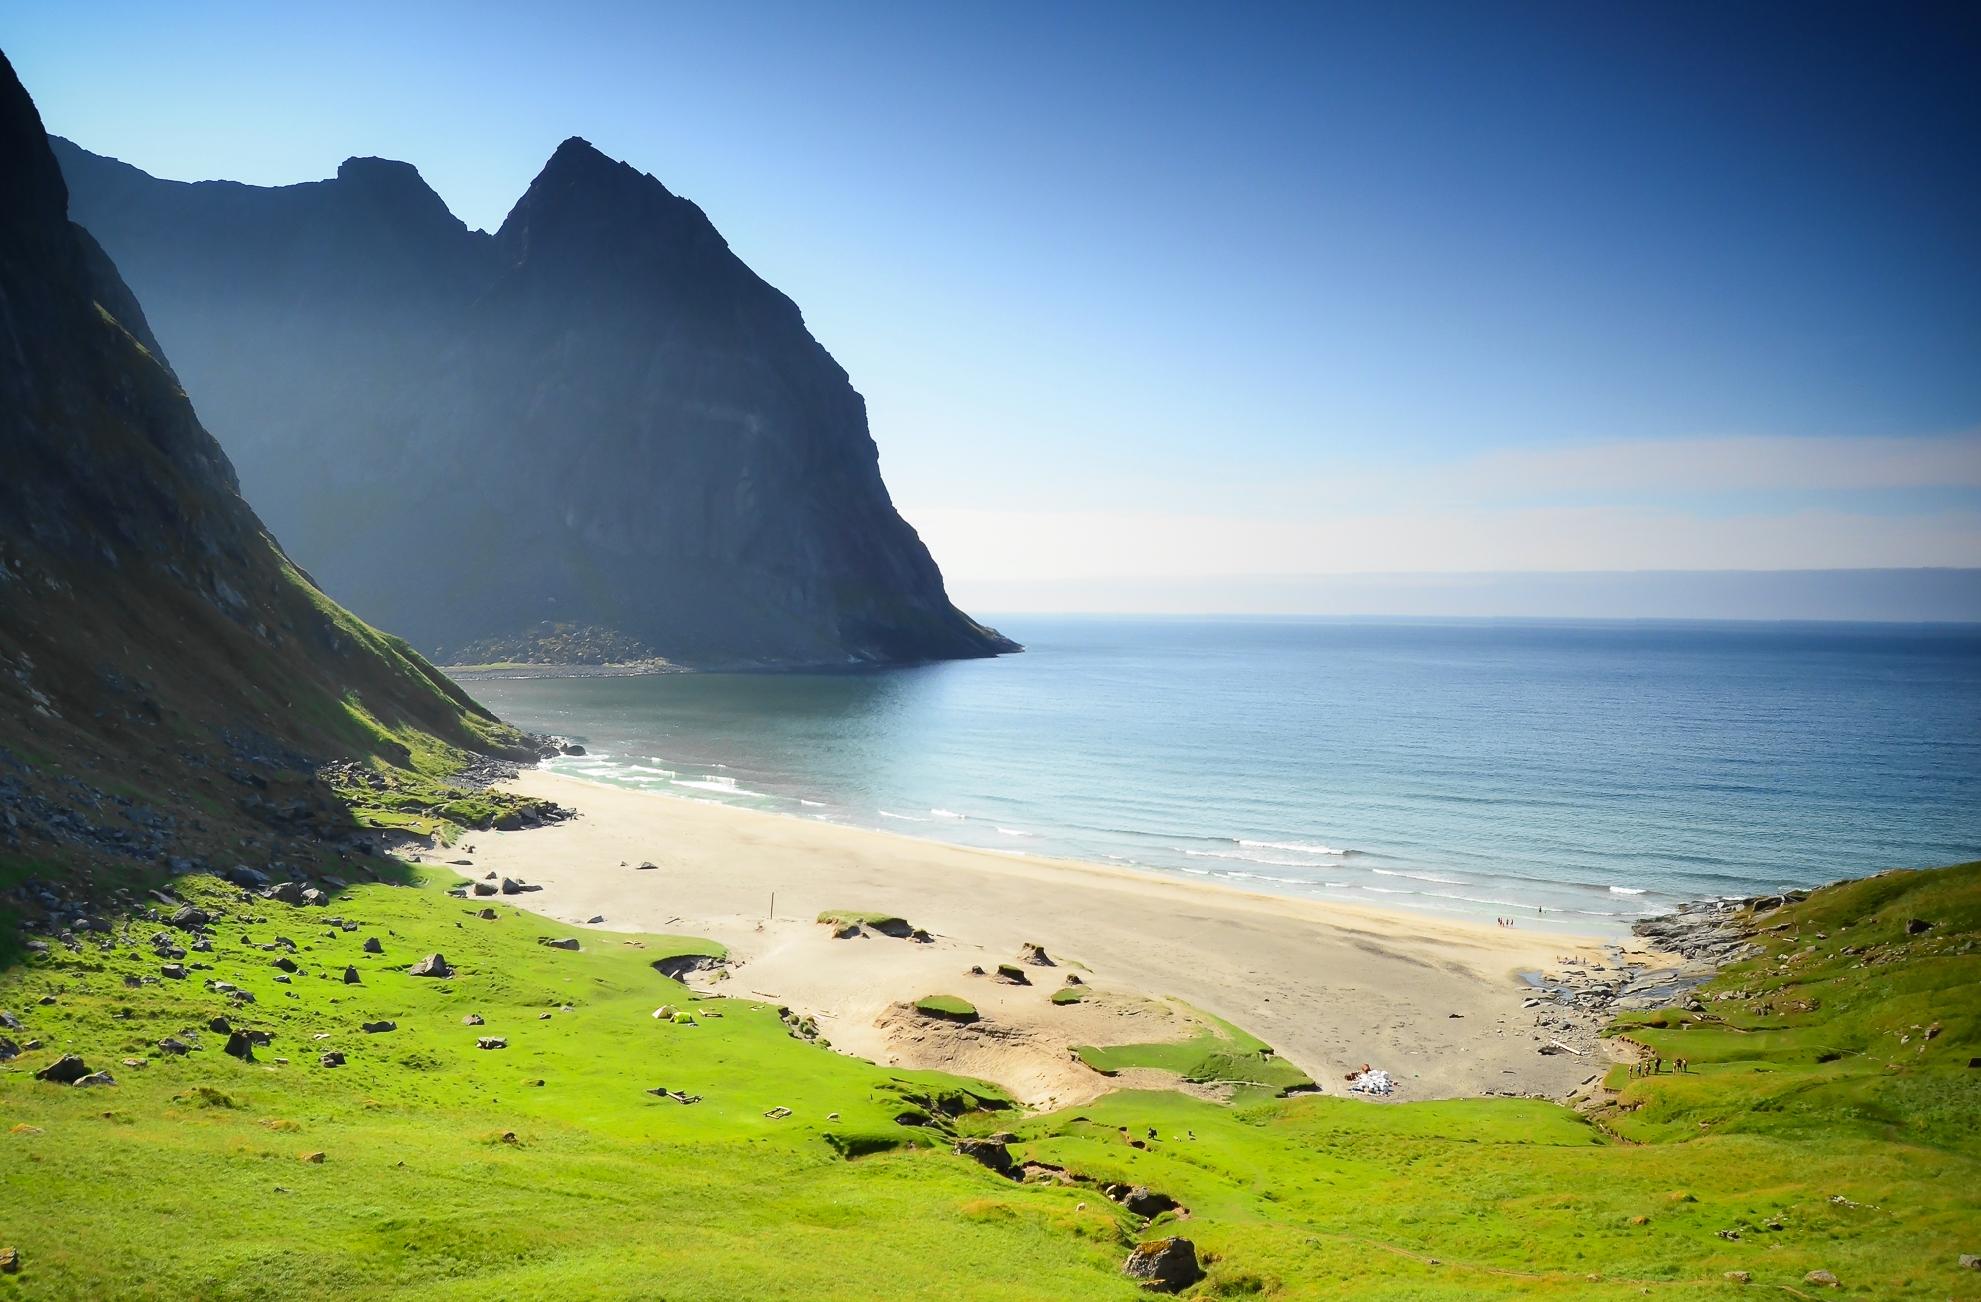 Kvalvika Beach   Hiking in Lofoten Islands   Norway Trave...